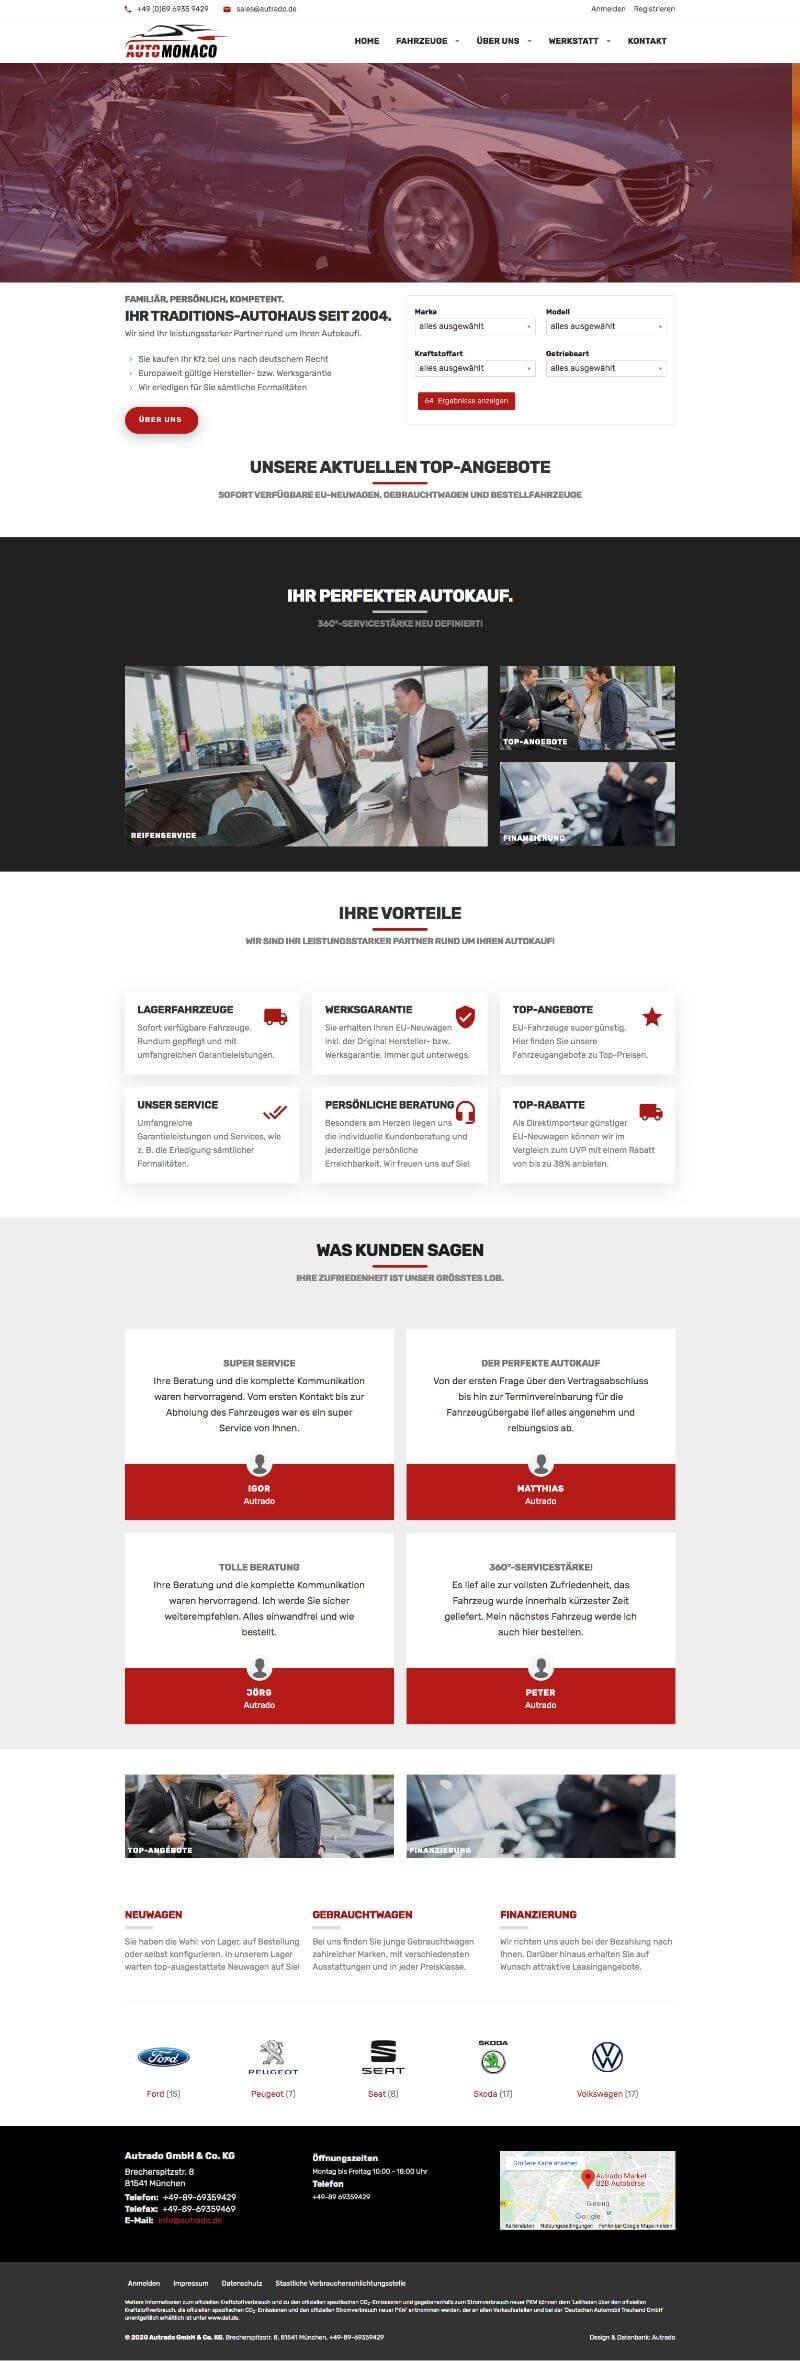 Designvorlage Monaco mit virtuellem Showroom